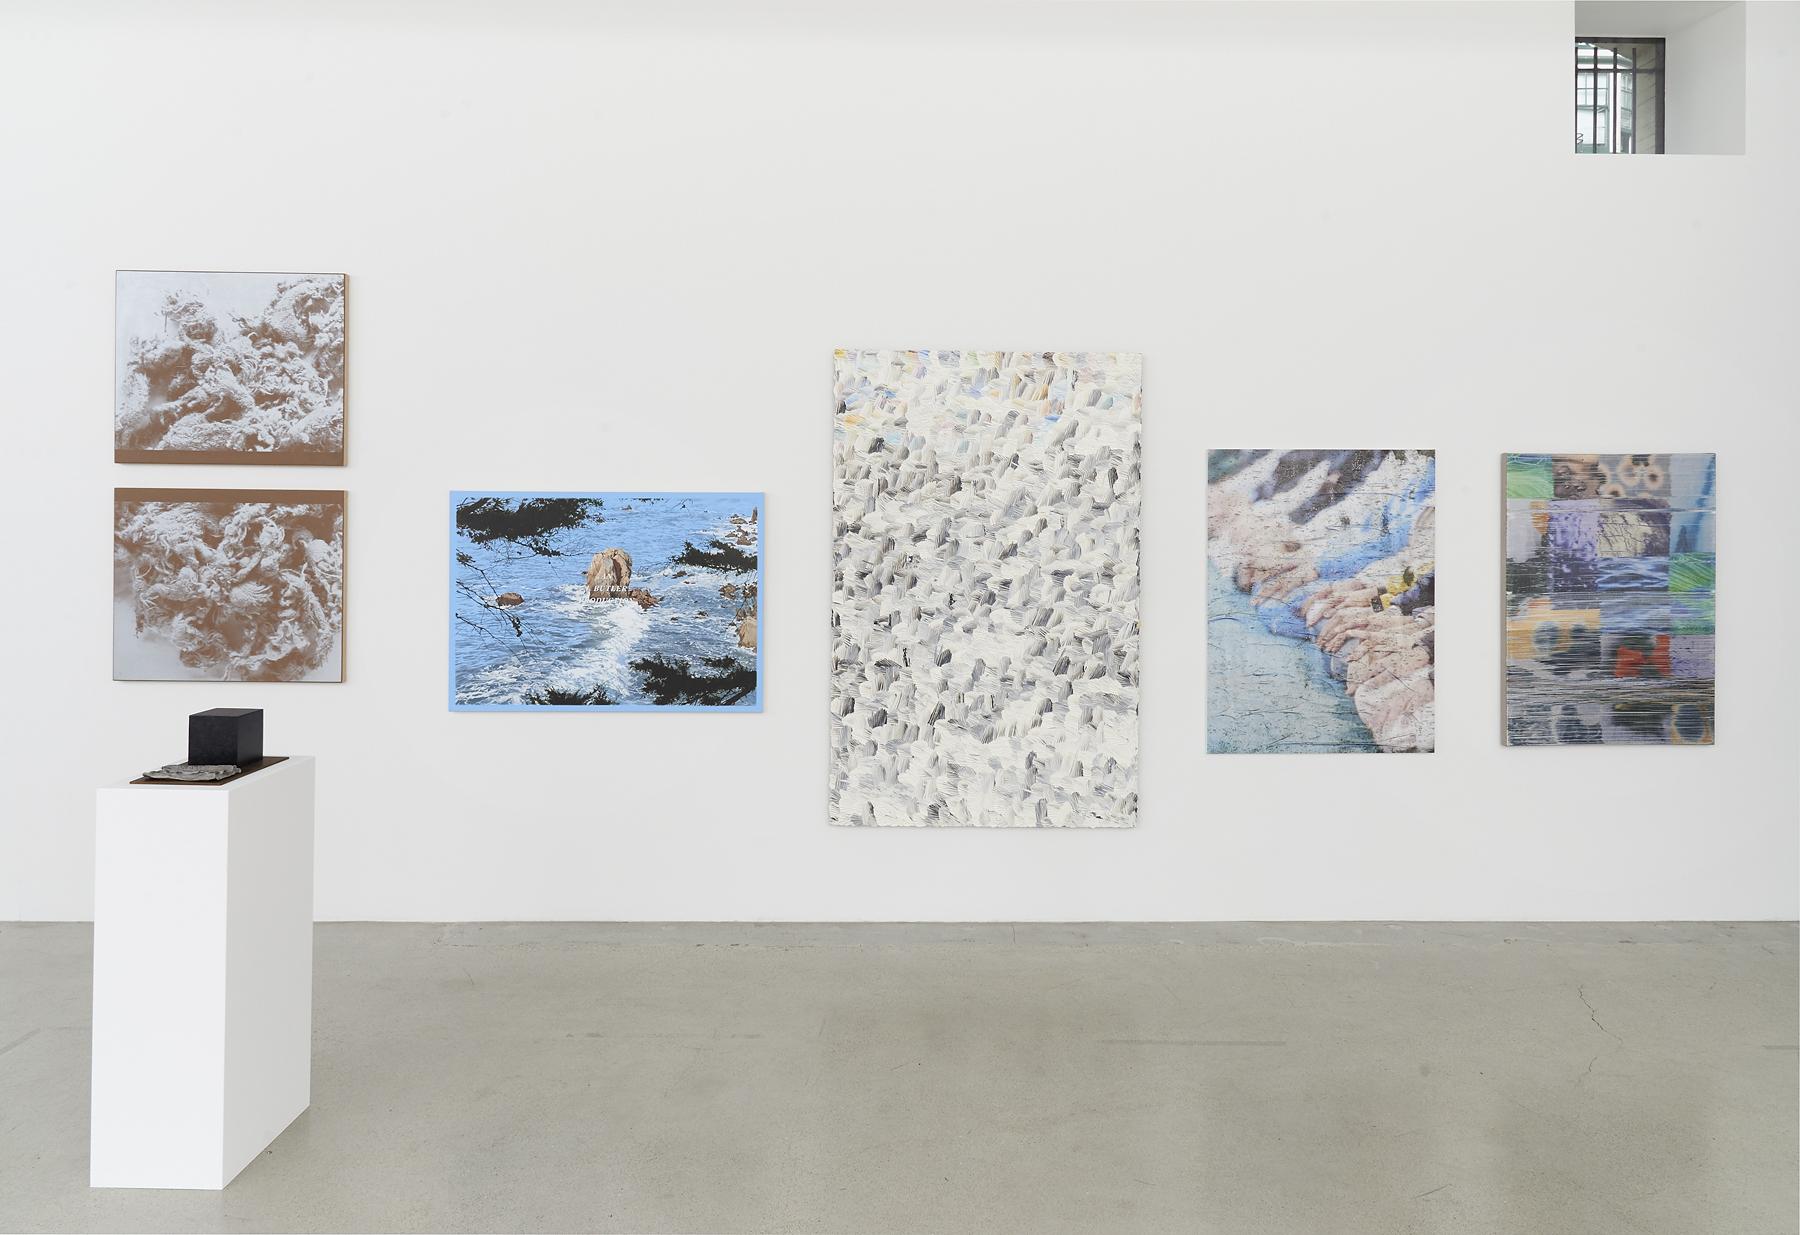 Kinship, 2018_Jessica Silverman Gallery, Installation view 03.PRS.jpg